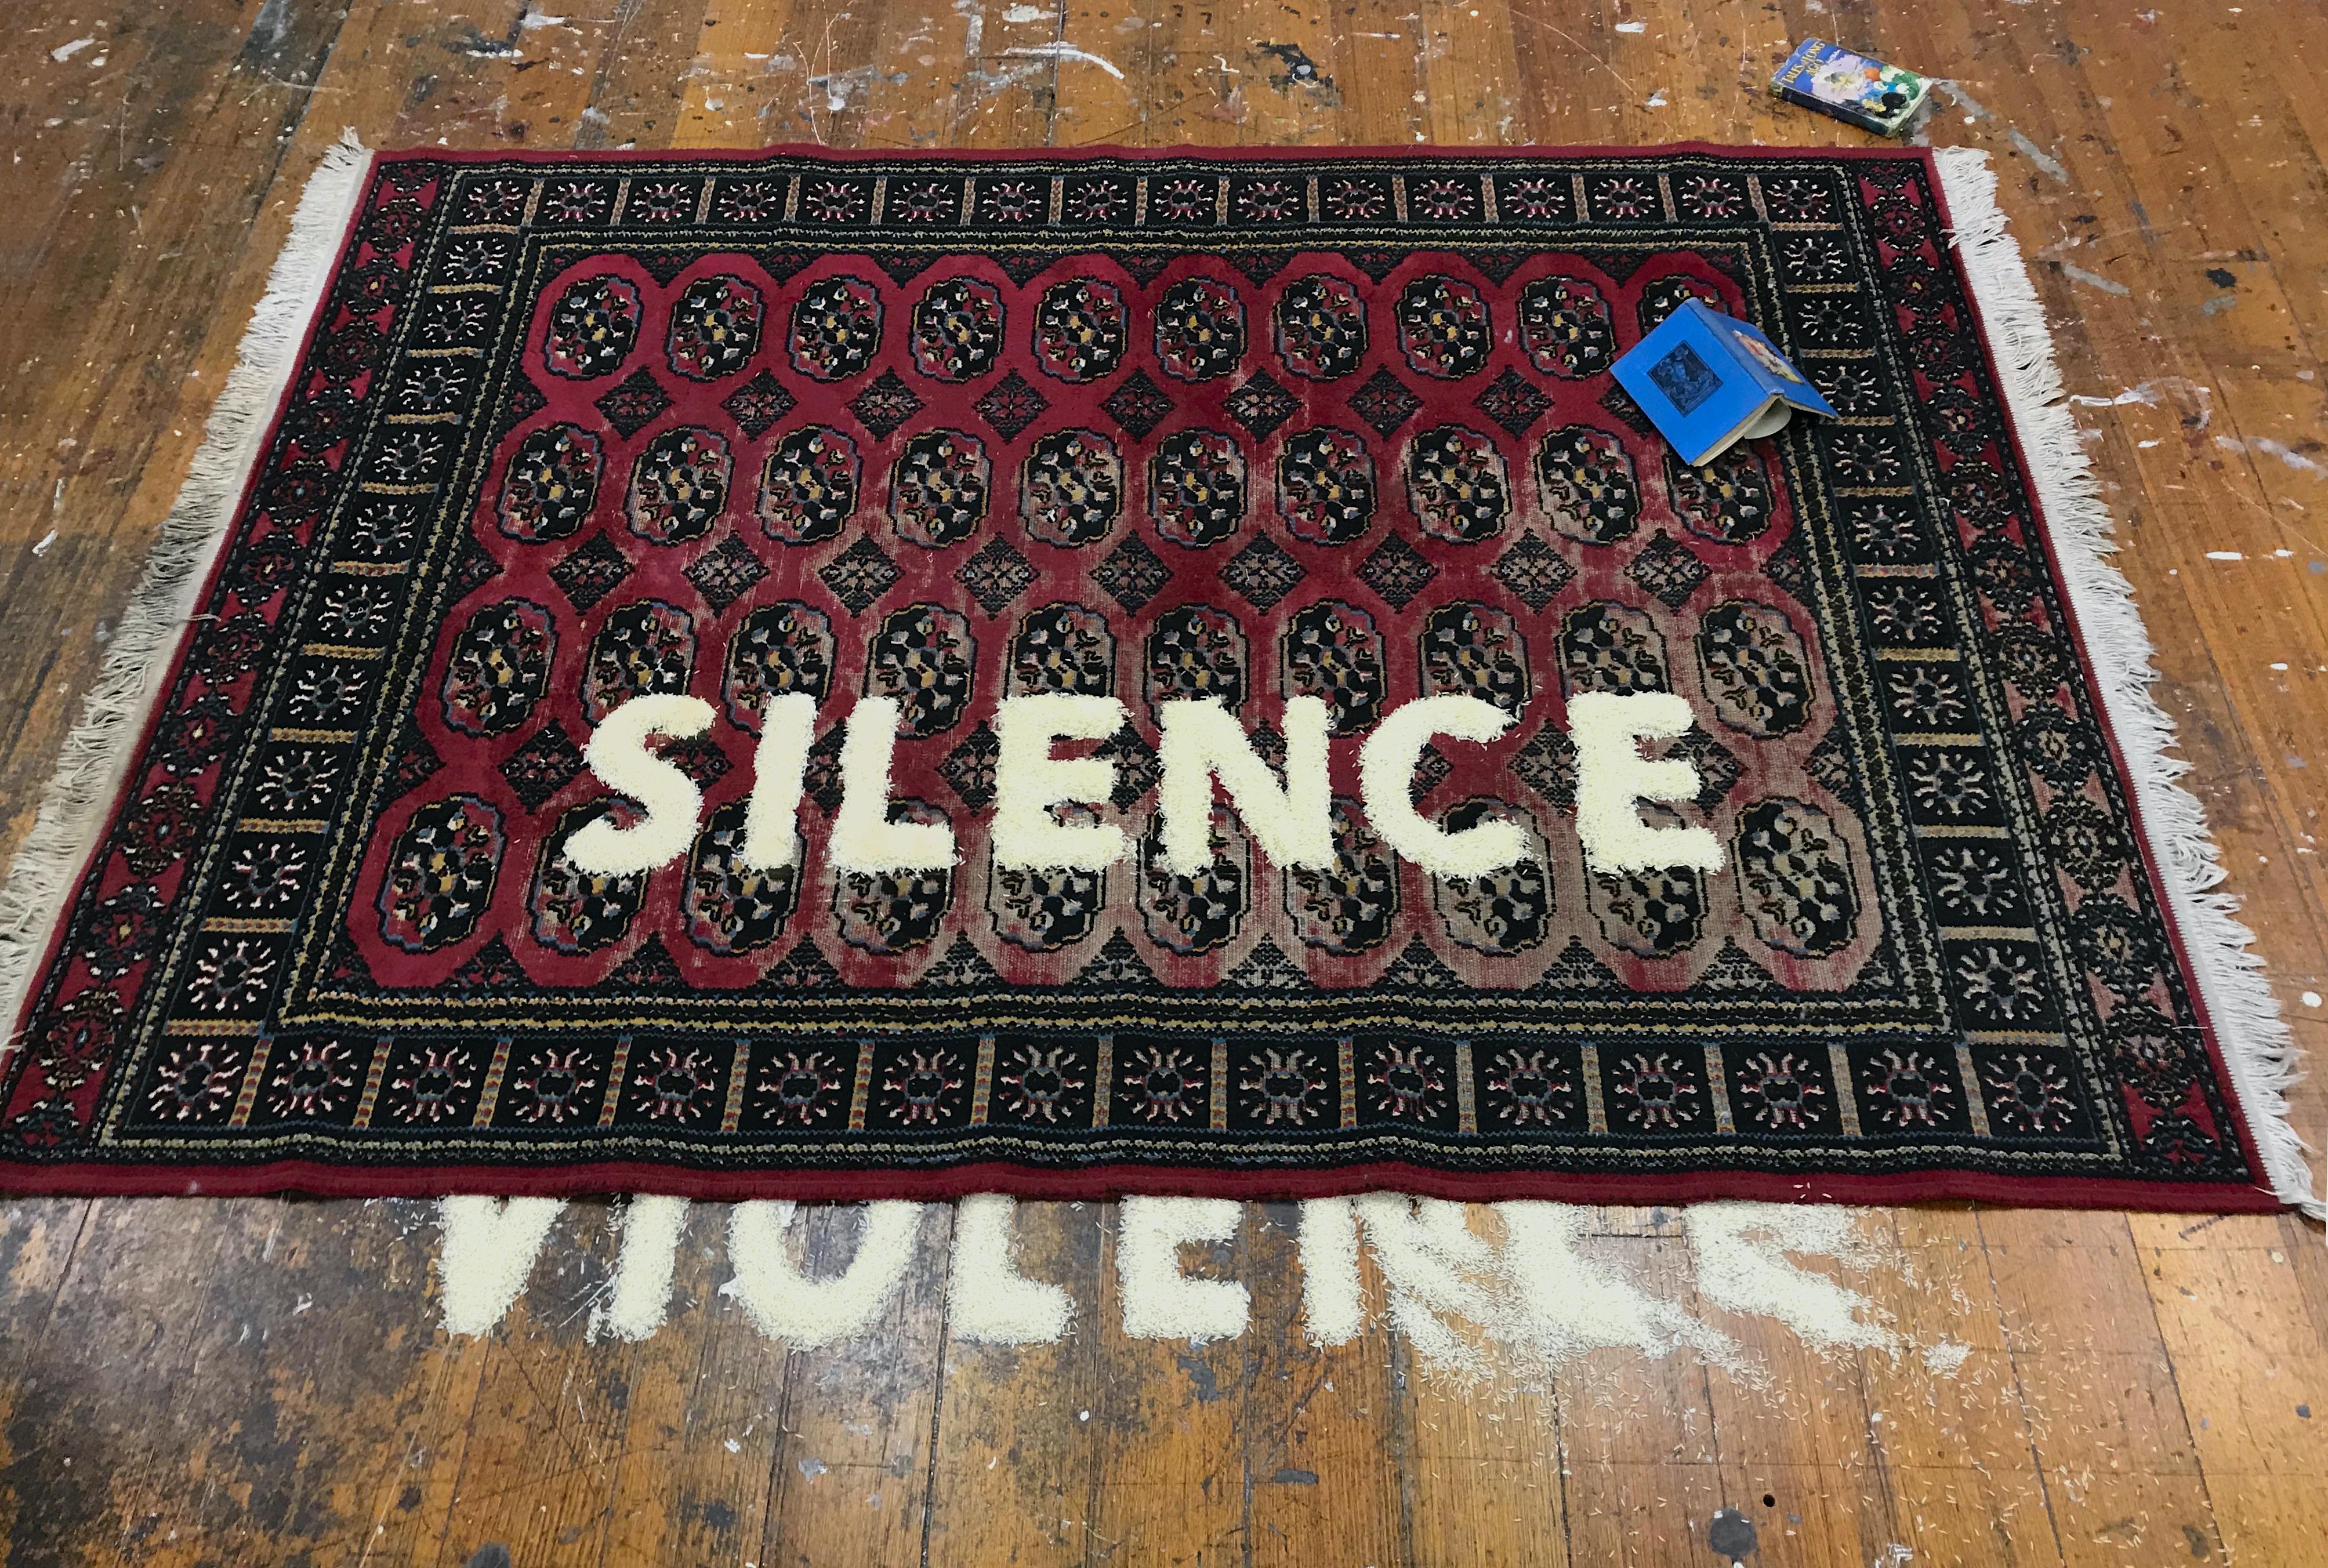 Claire Bridge - 3 Bridge Claire-Silence-Violence-2018-handwoven Bokhara rug-basmati rice- vintage books- 170 x 240cm with variable dimensions.jpg